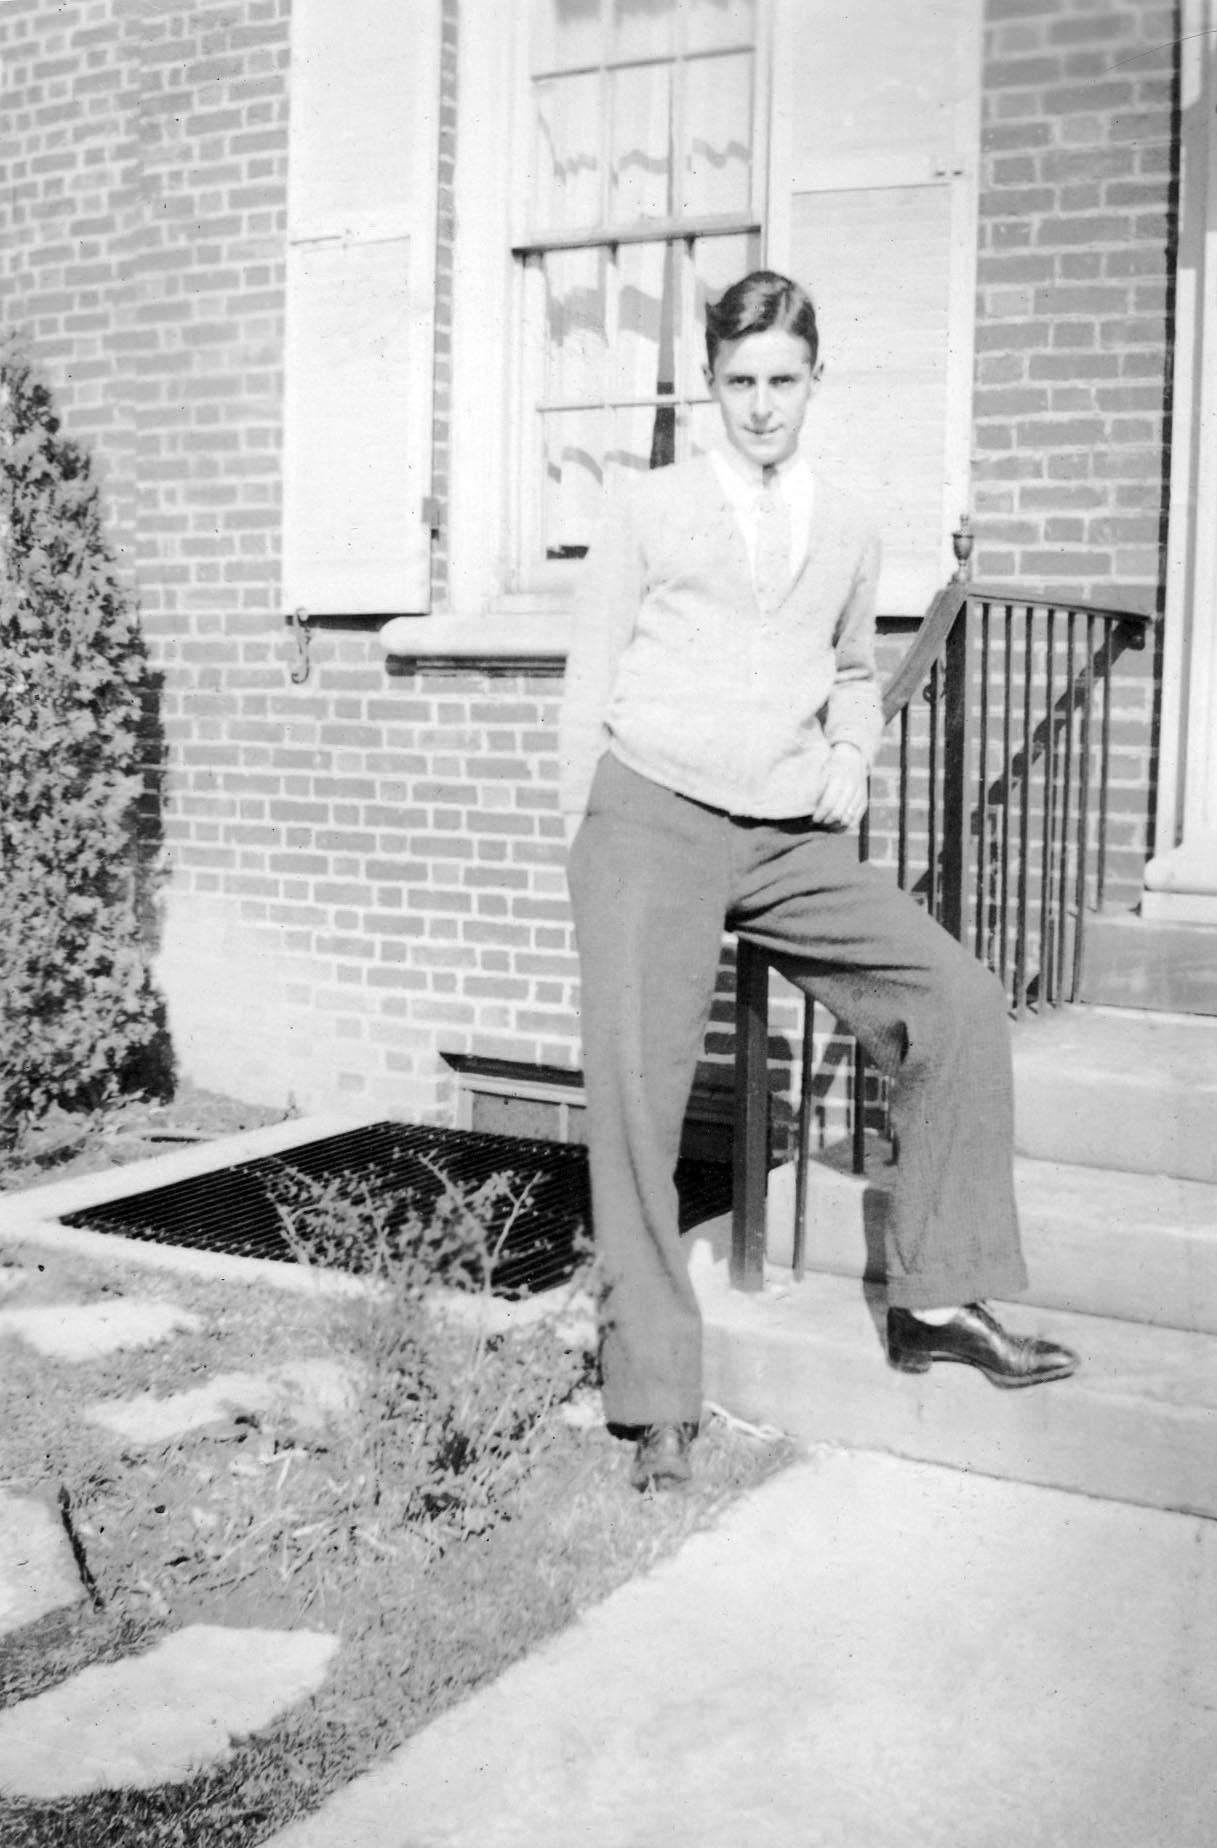 John M. Metzger 1939, Bellevue, PA